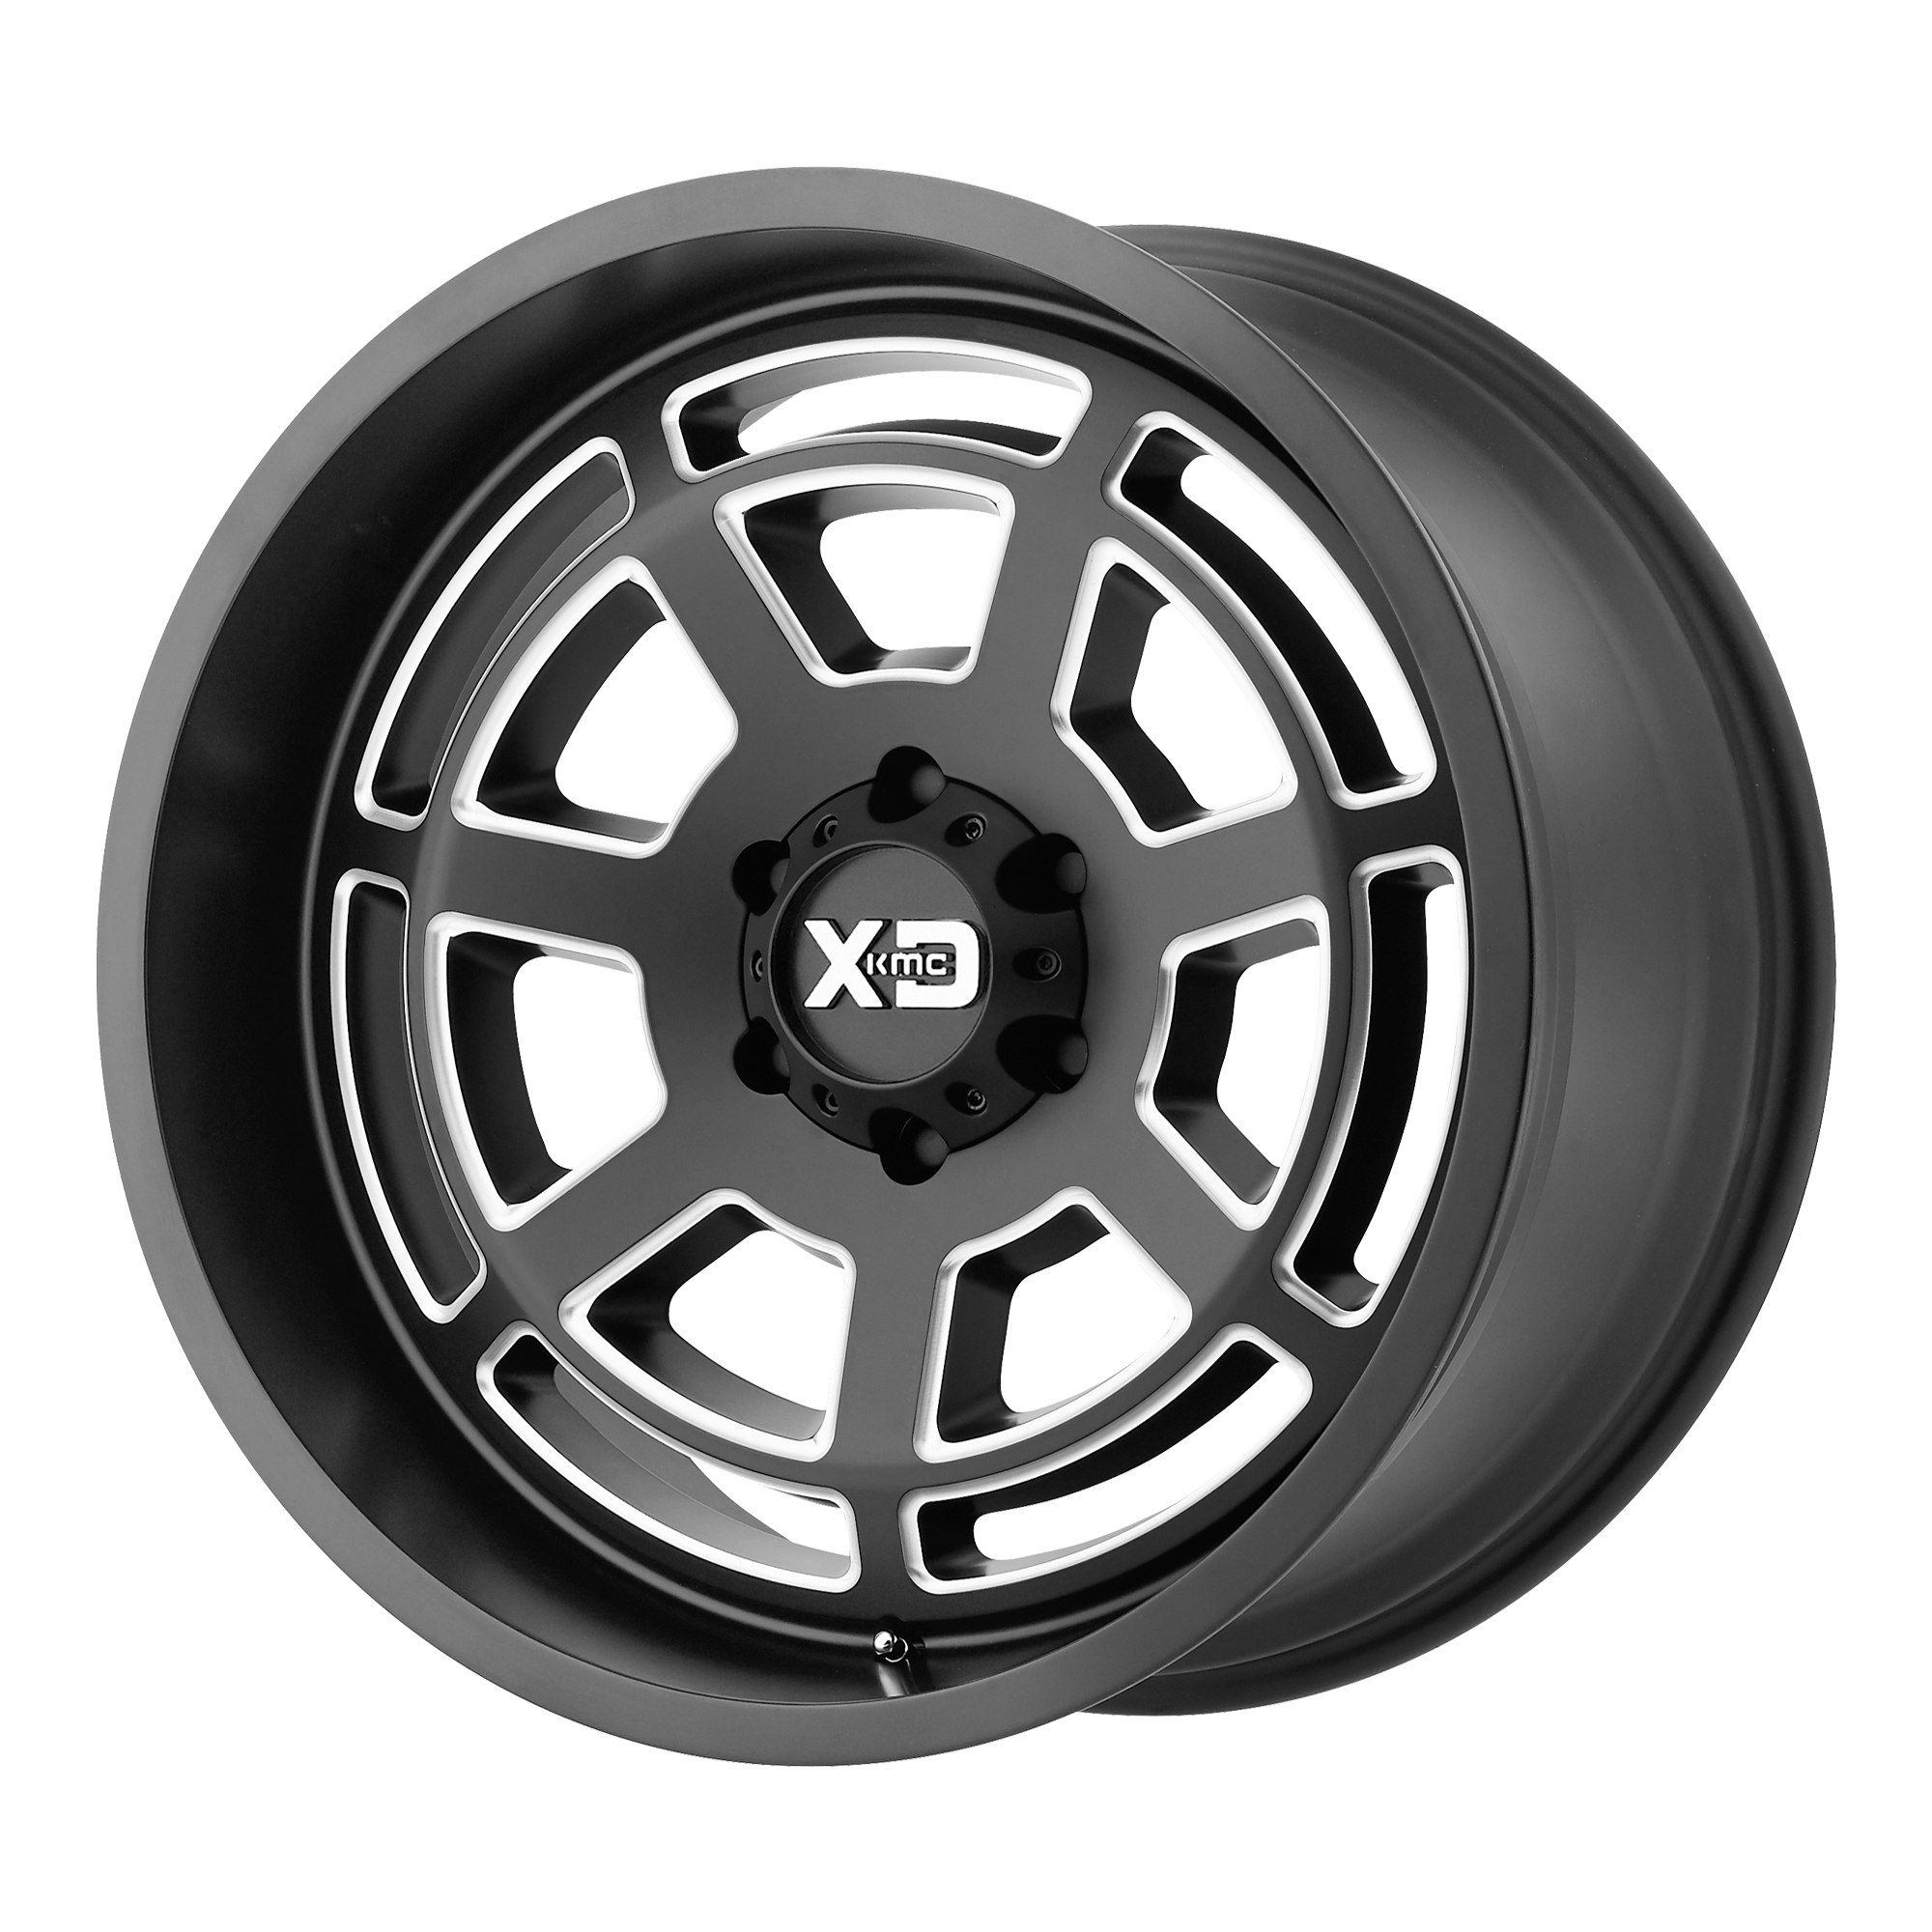 XD SERIES XD824 BONES hliníkové disky 10x22 5x127 ET-18 Satin Black Milled